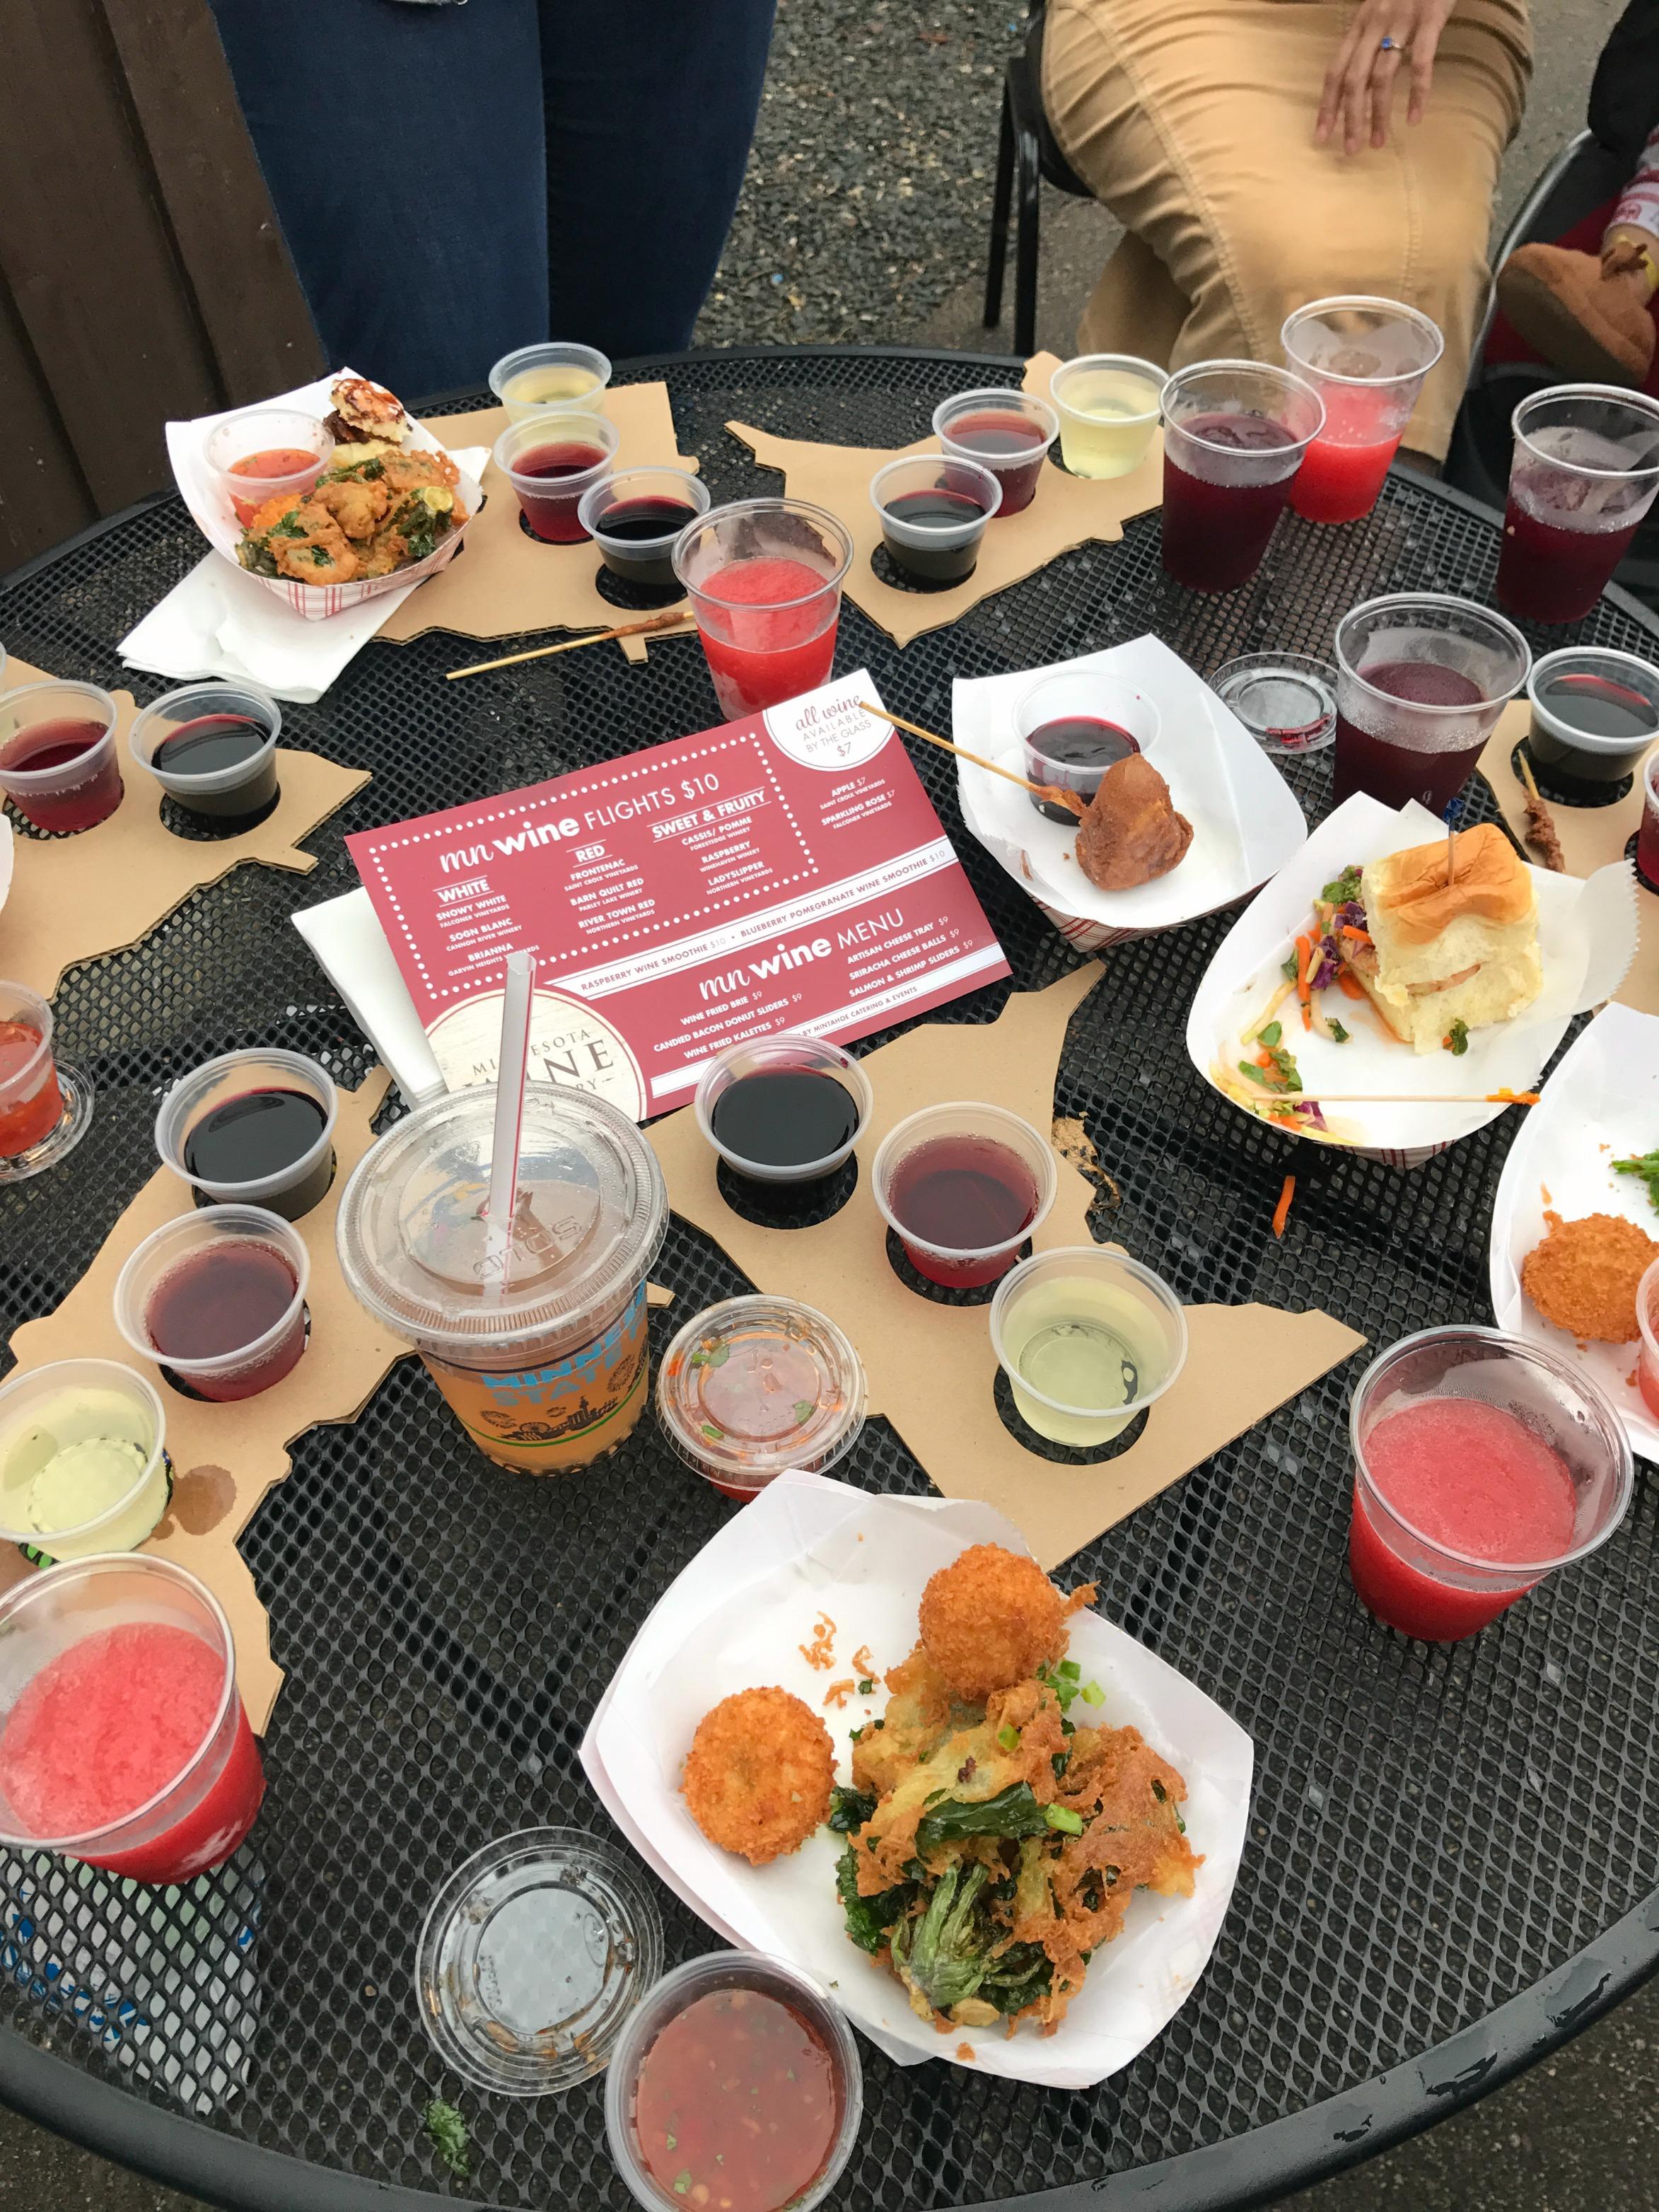 Minnesota State Fair Food and More